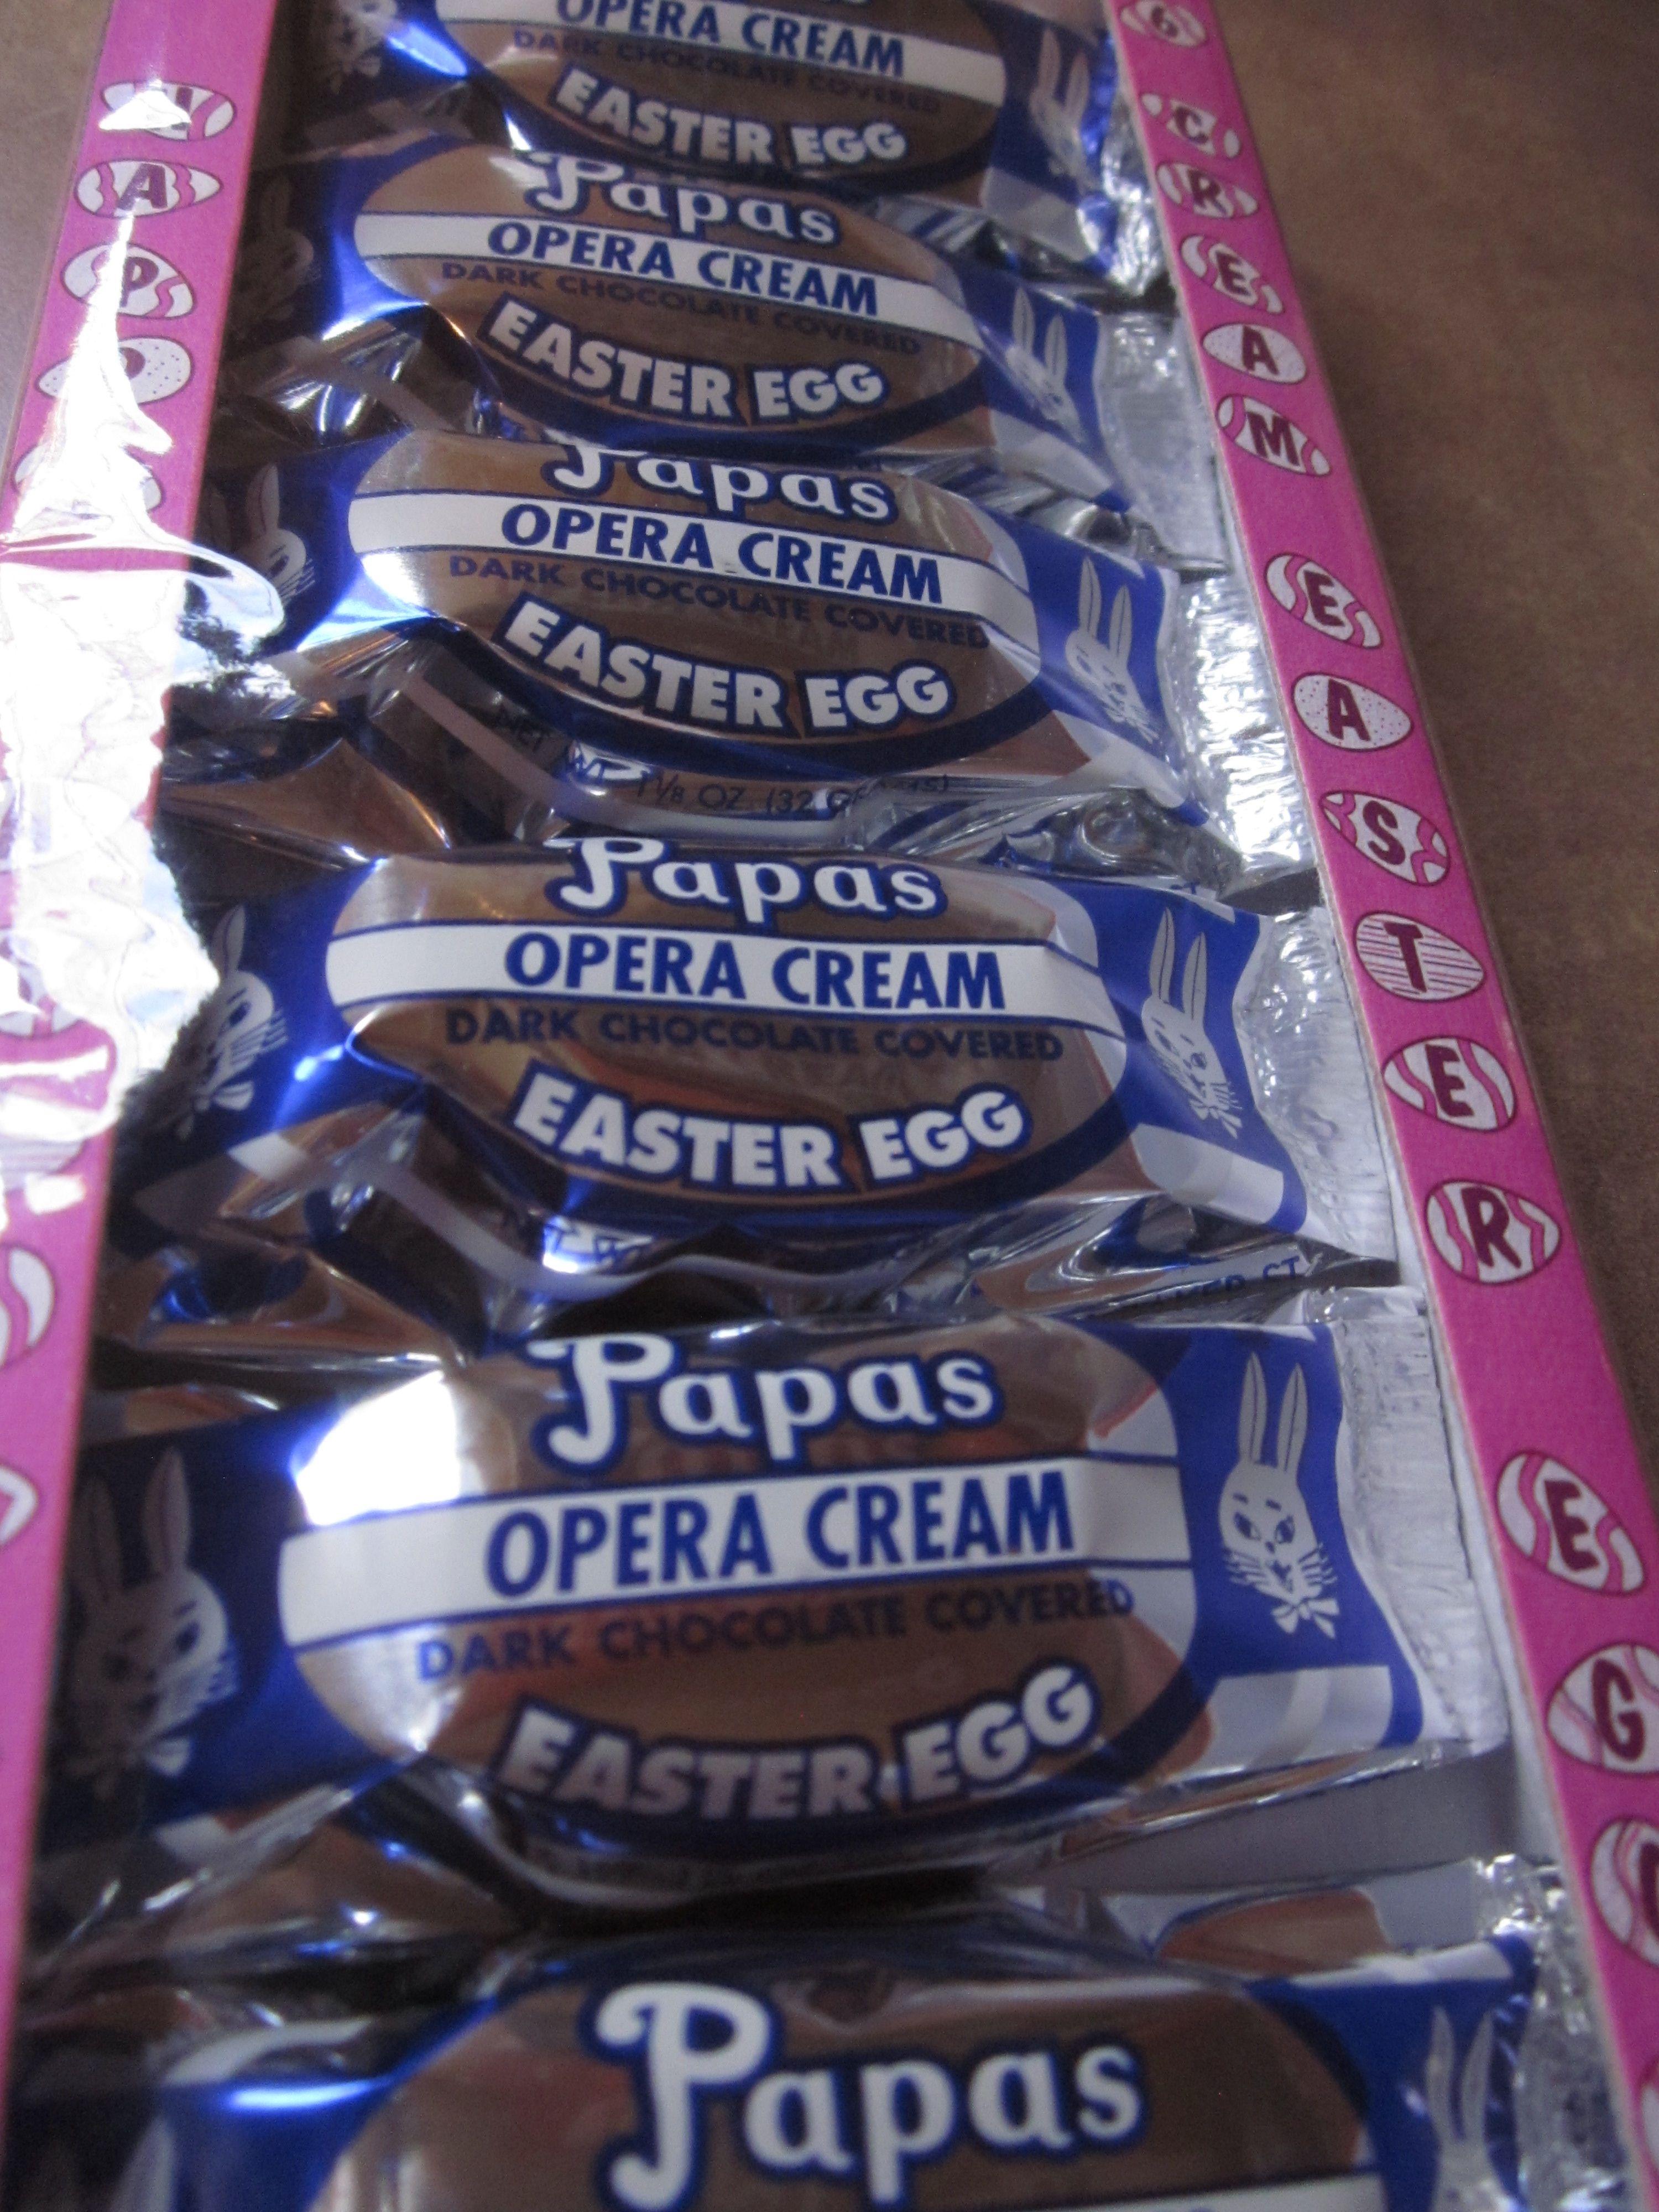 Papas Opera Cream Eggs A Cincy Easter Favorite